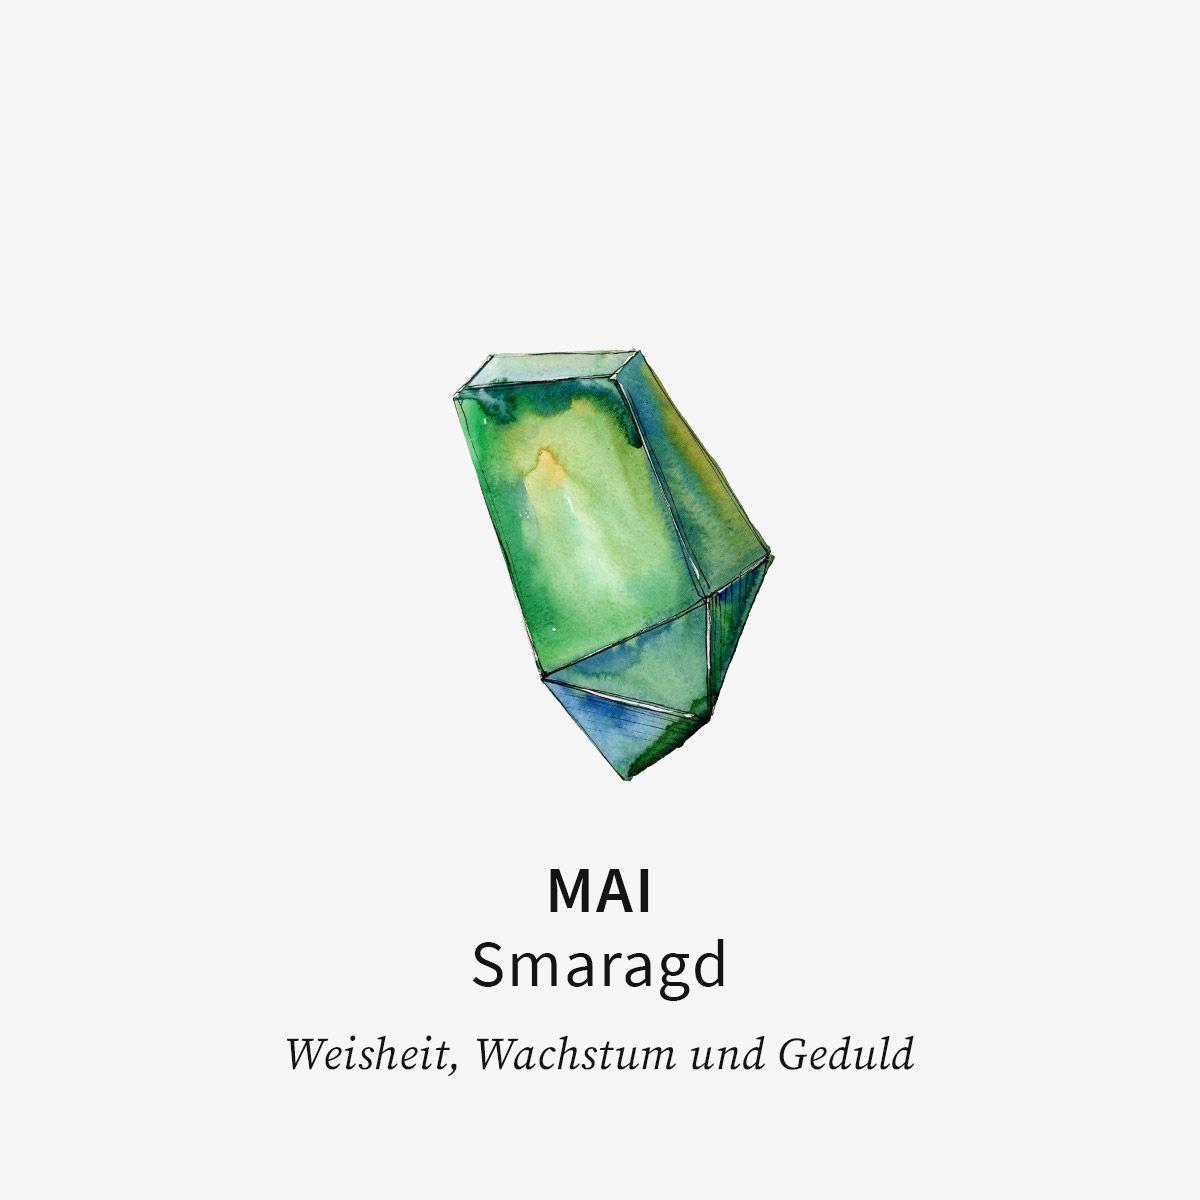 Birthstone May - Halsketten - 18k vergoldet